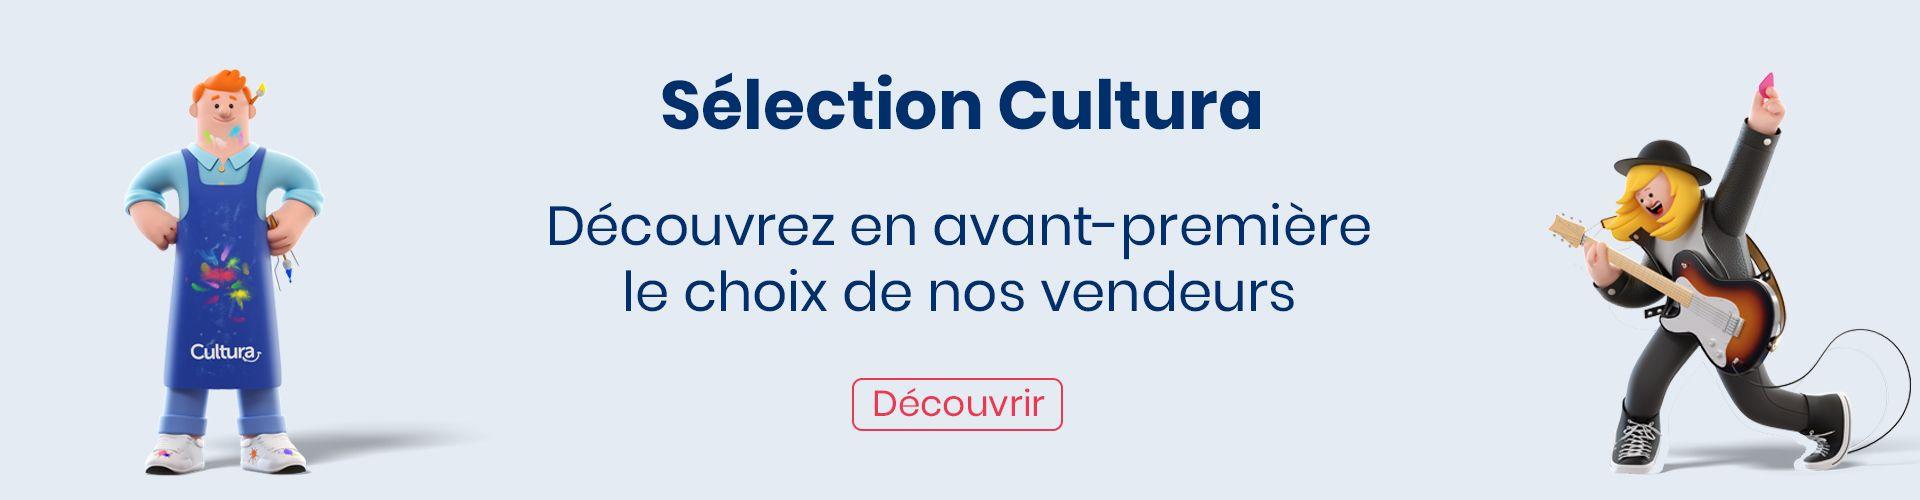 Sélection cultura